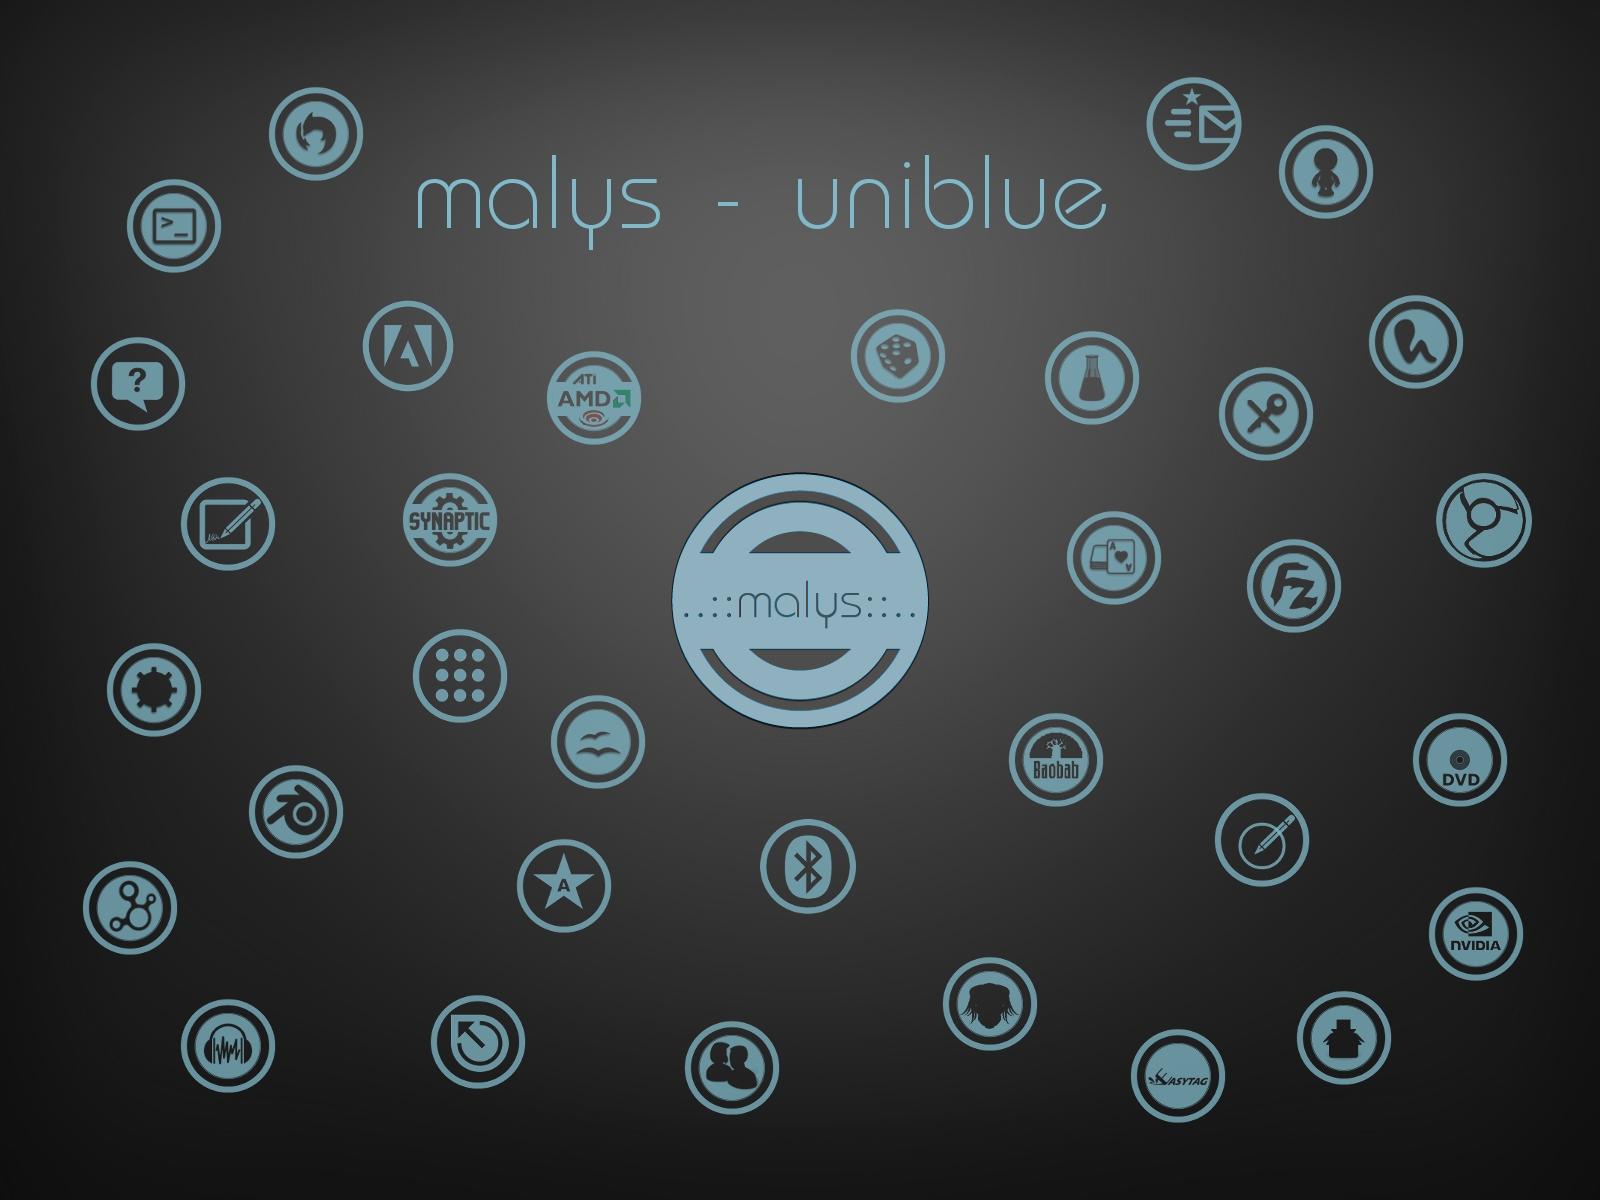 malys - uniblue     update 11.09.2012